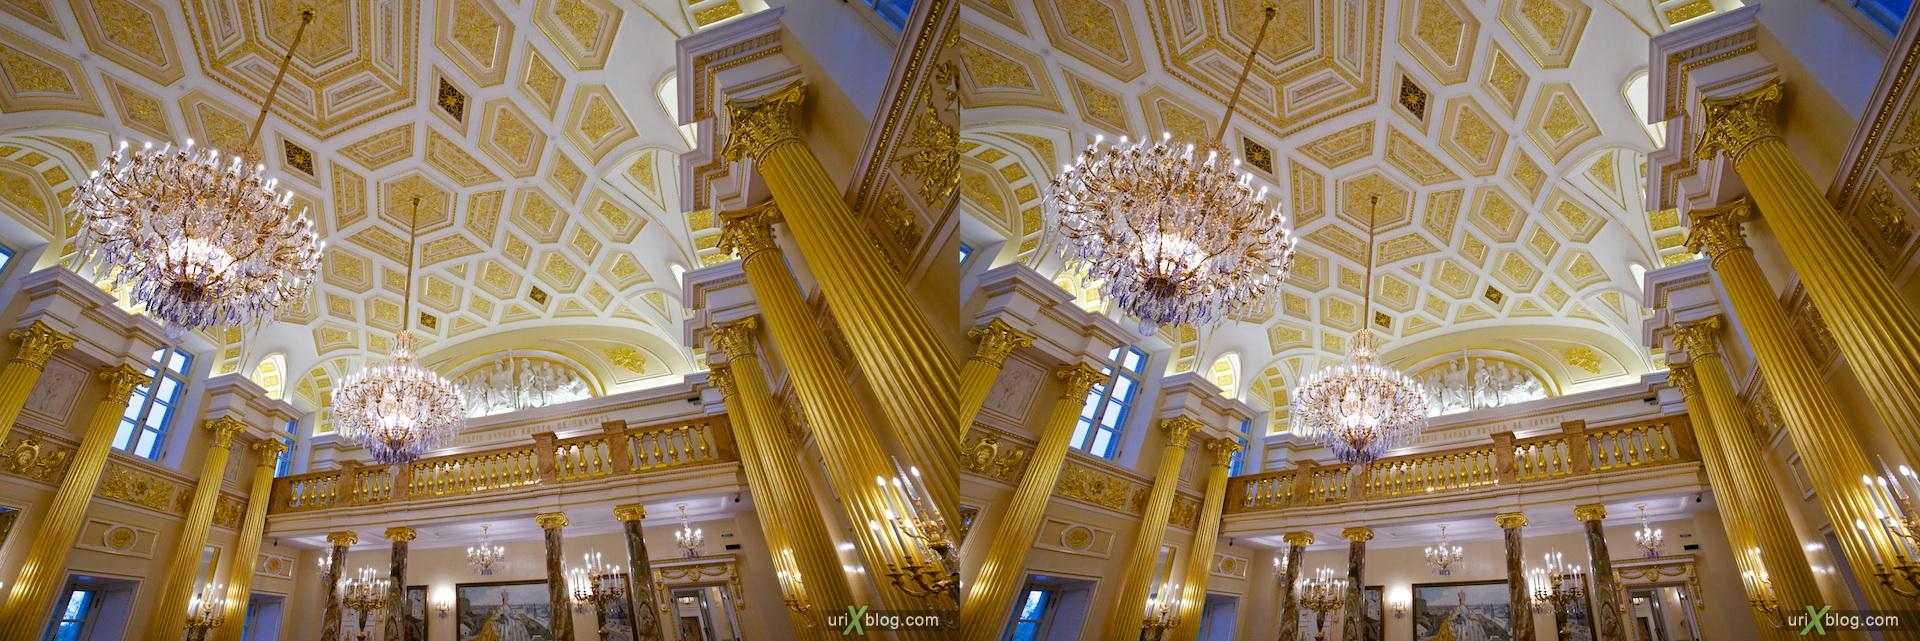 3D, stereo, cross-eyed, стерео, стереопара 2010 Царицыно Москва